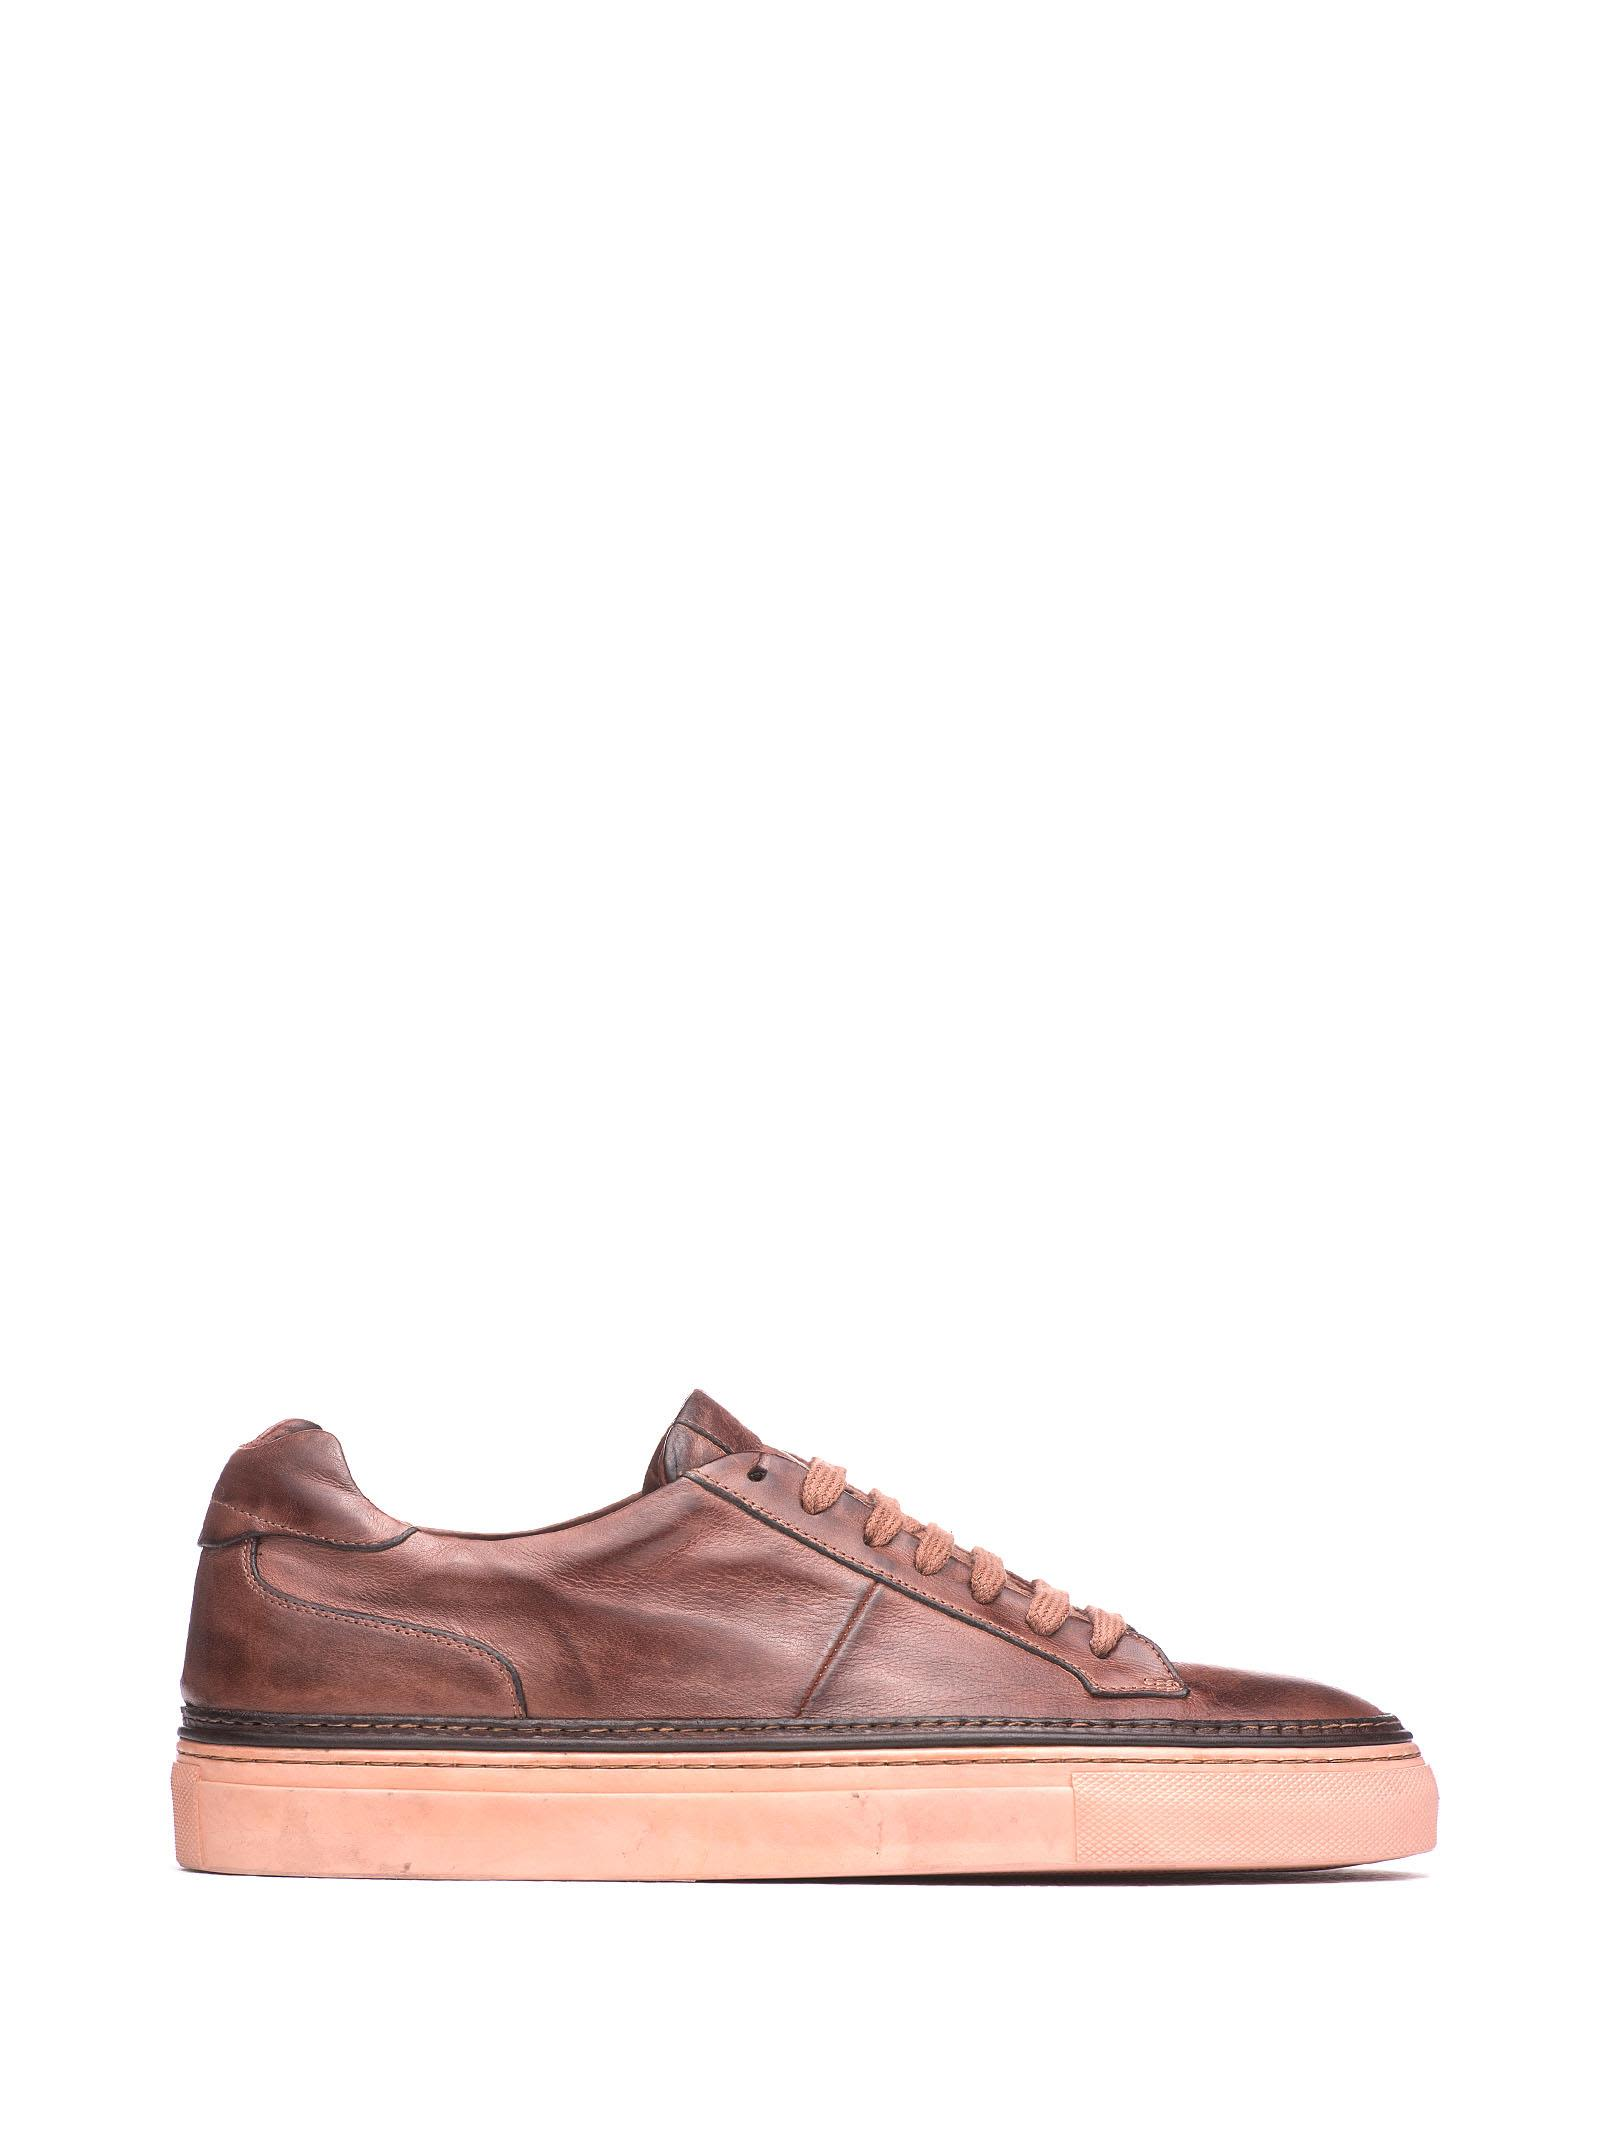 CORVARI Brown Leather Sneakers in Marrone